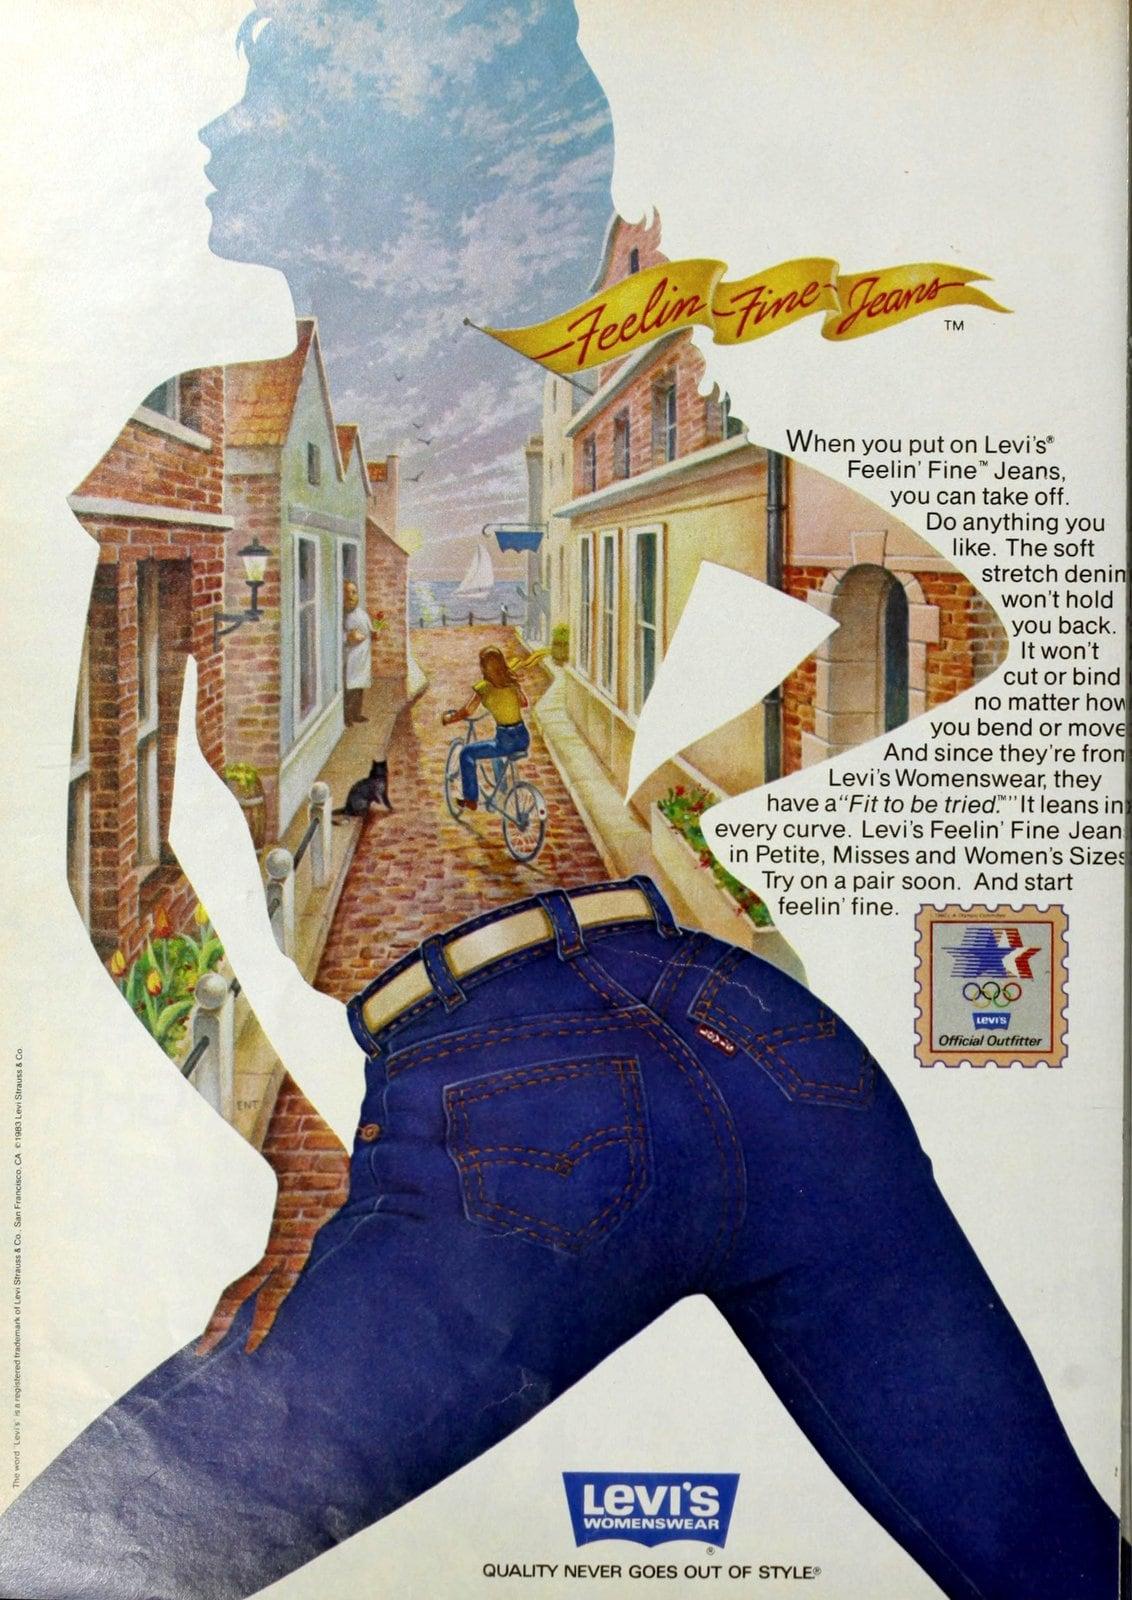 Vintage Levi's Feelin' Fine jeans (1983)